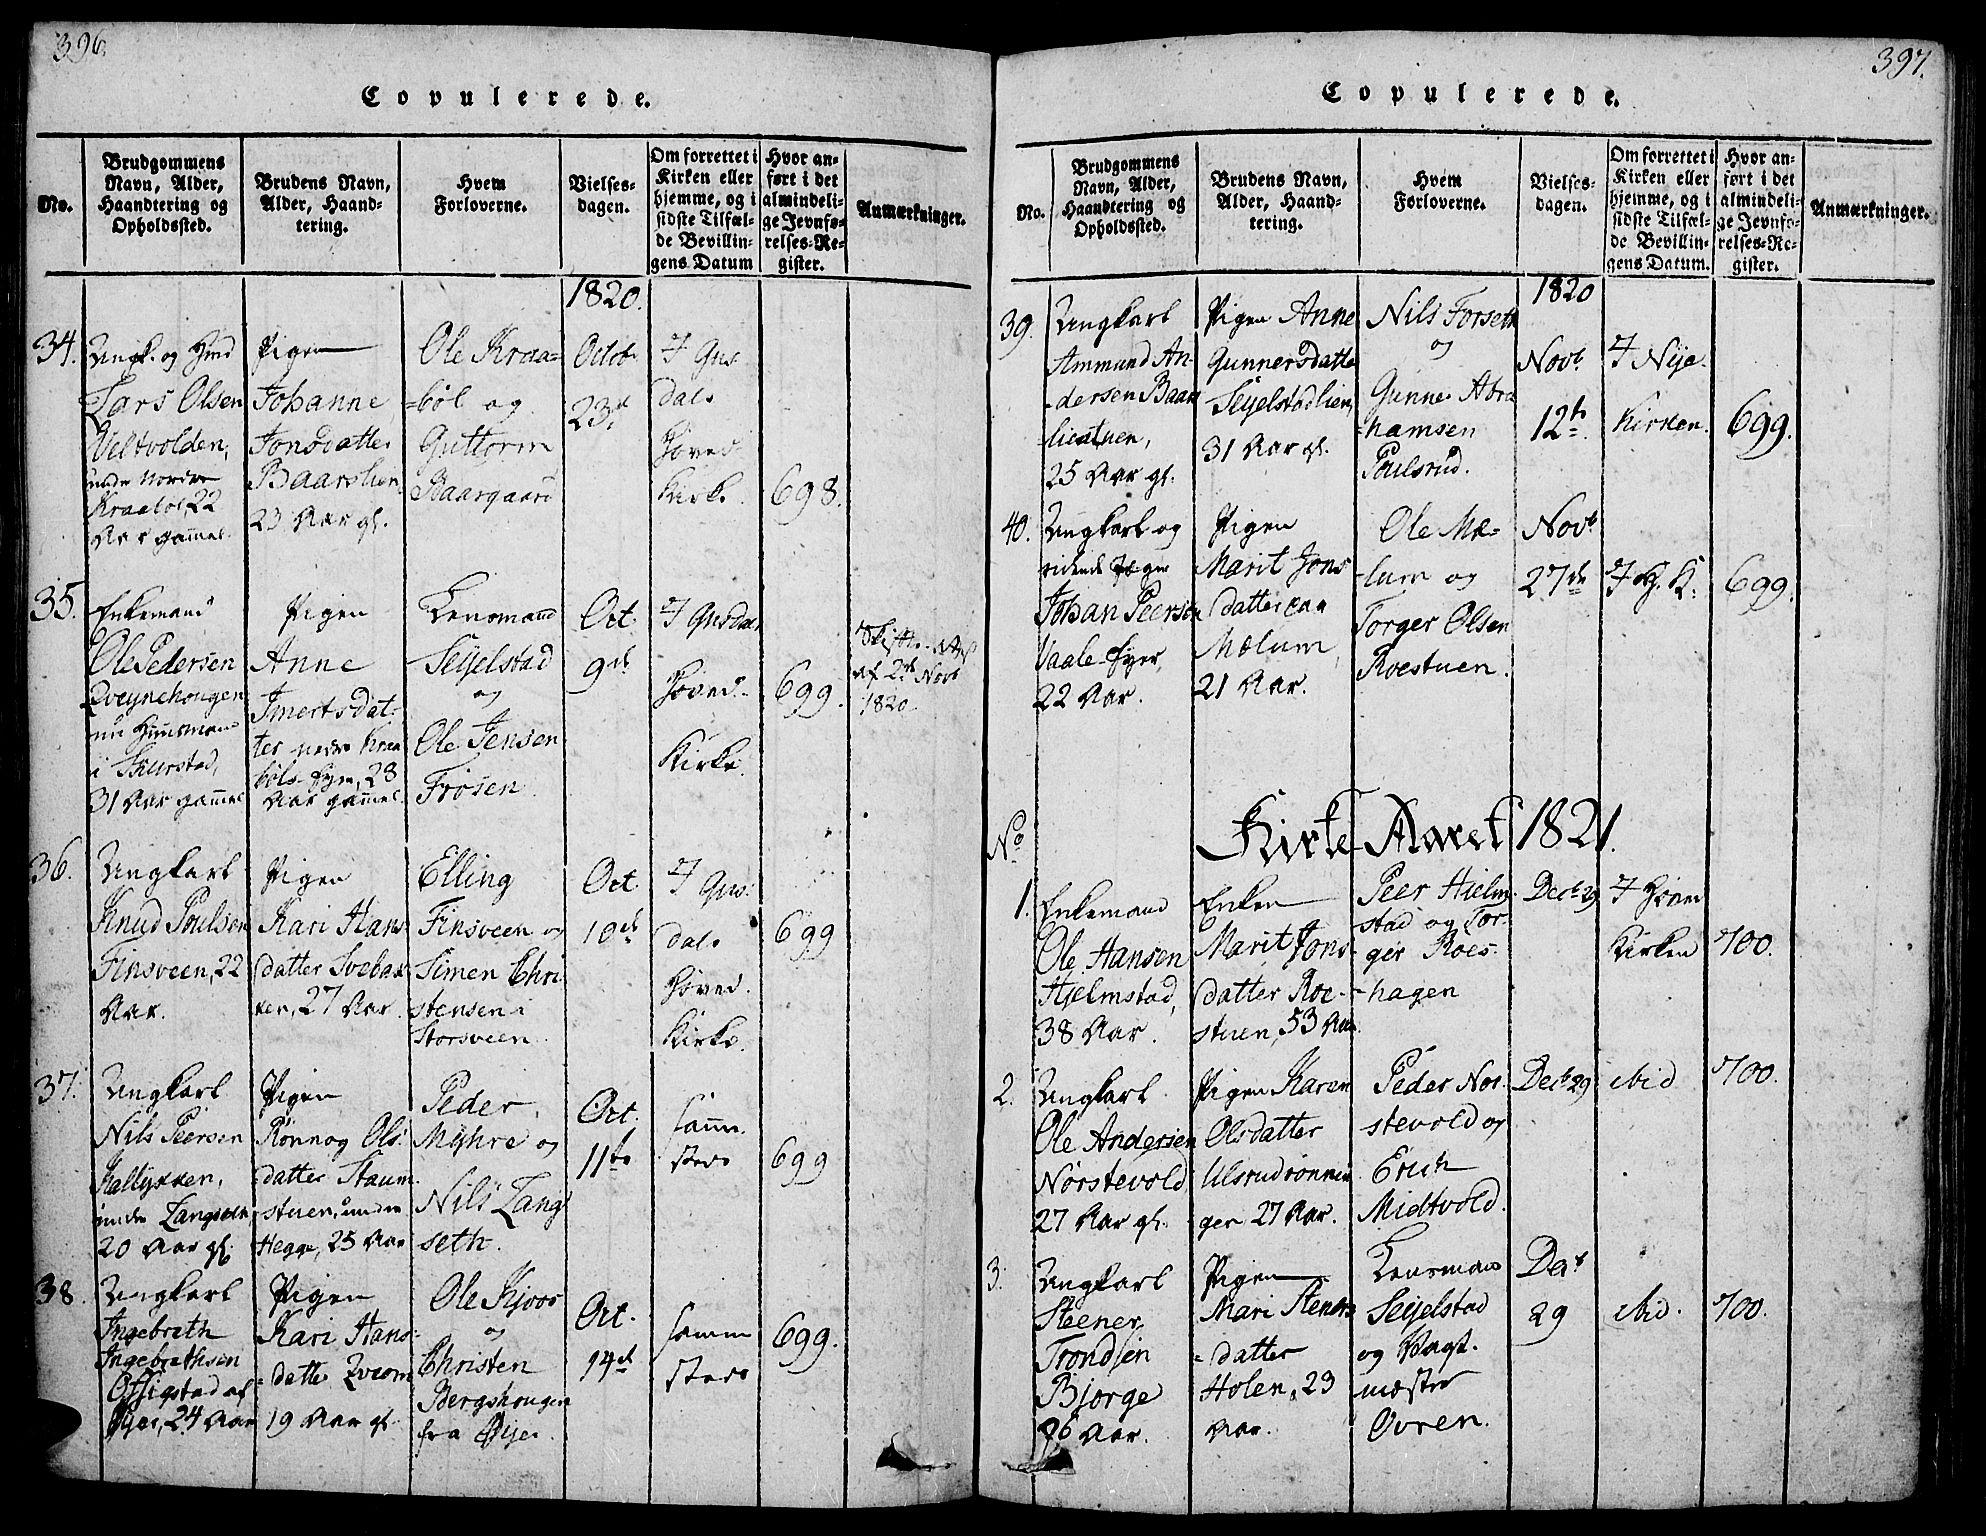 SAH, Gausdal prestekontor, Ministerialbok nr. 5, 1817-1829, s. 396-397